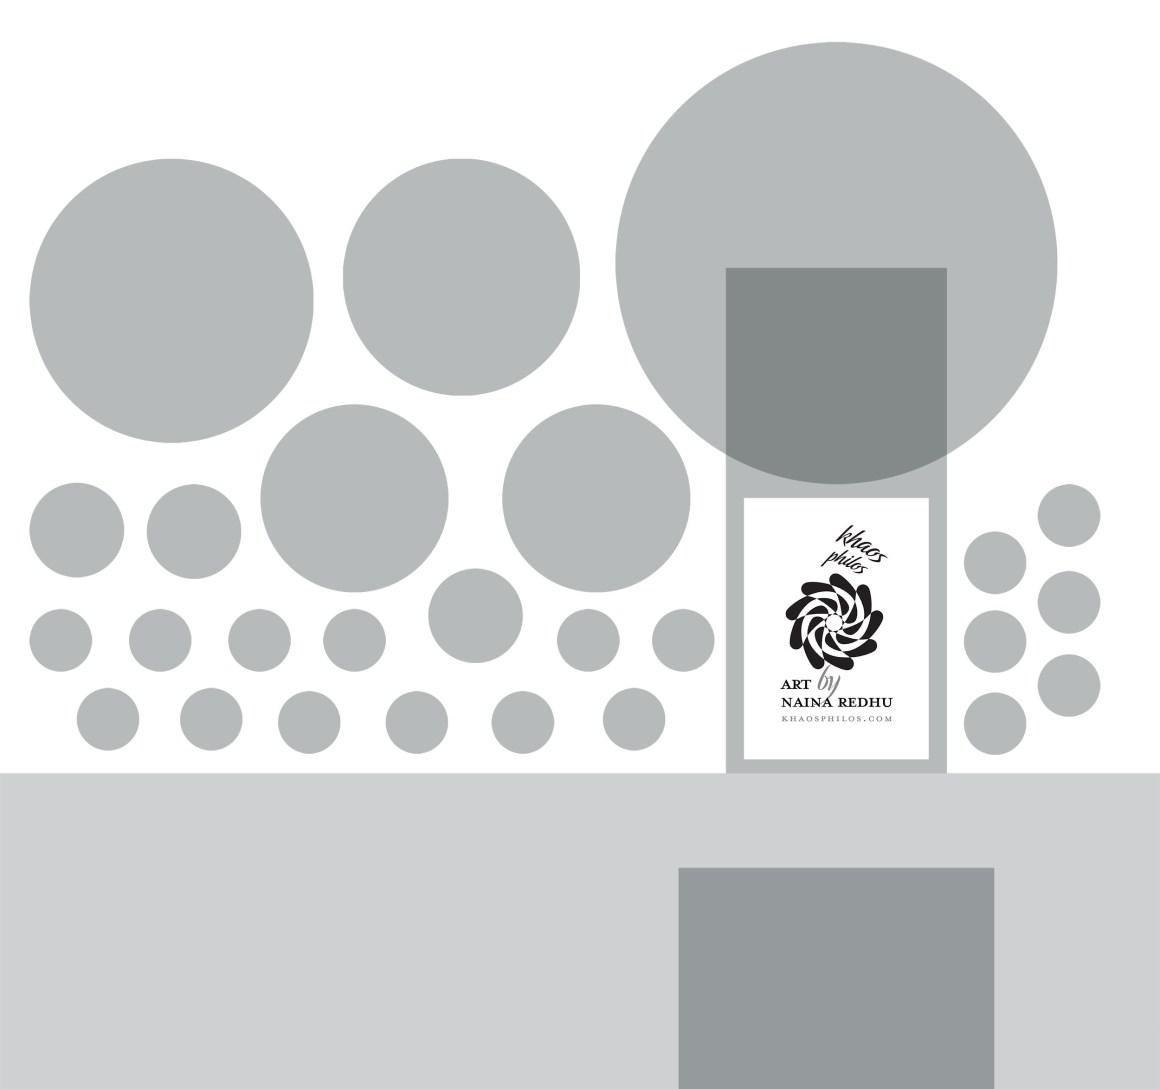 khaosphilos, khaos philos, naina redhu, naina.co, contemporary art, contemporary artist, abstract art, abstract artist, acrylic paint, acrylics on canvas, wearable art, art exhibit, art pop-up, art wall, windmill design festival, aya nagar, windmill interiors, windmill furniture, canvases, hand painted, setting up an exhibition, hanging art on walls, marketing material, poster, branding, transporting a large canvas, transporting a large round canvas,